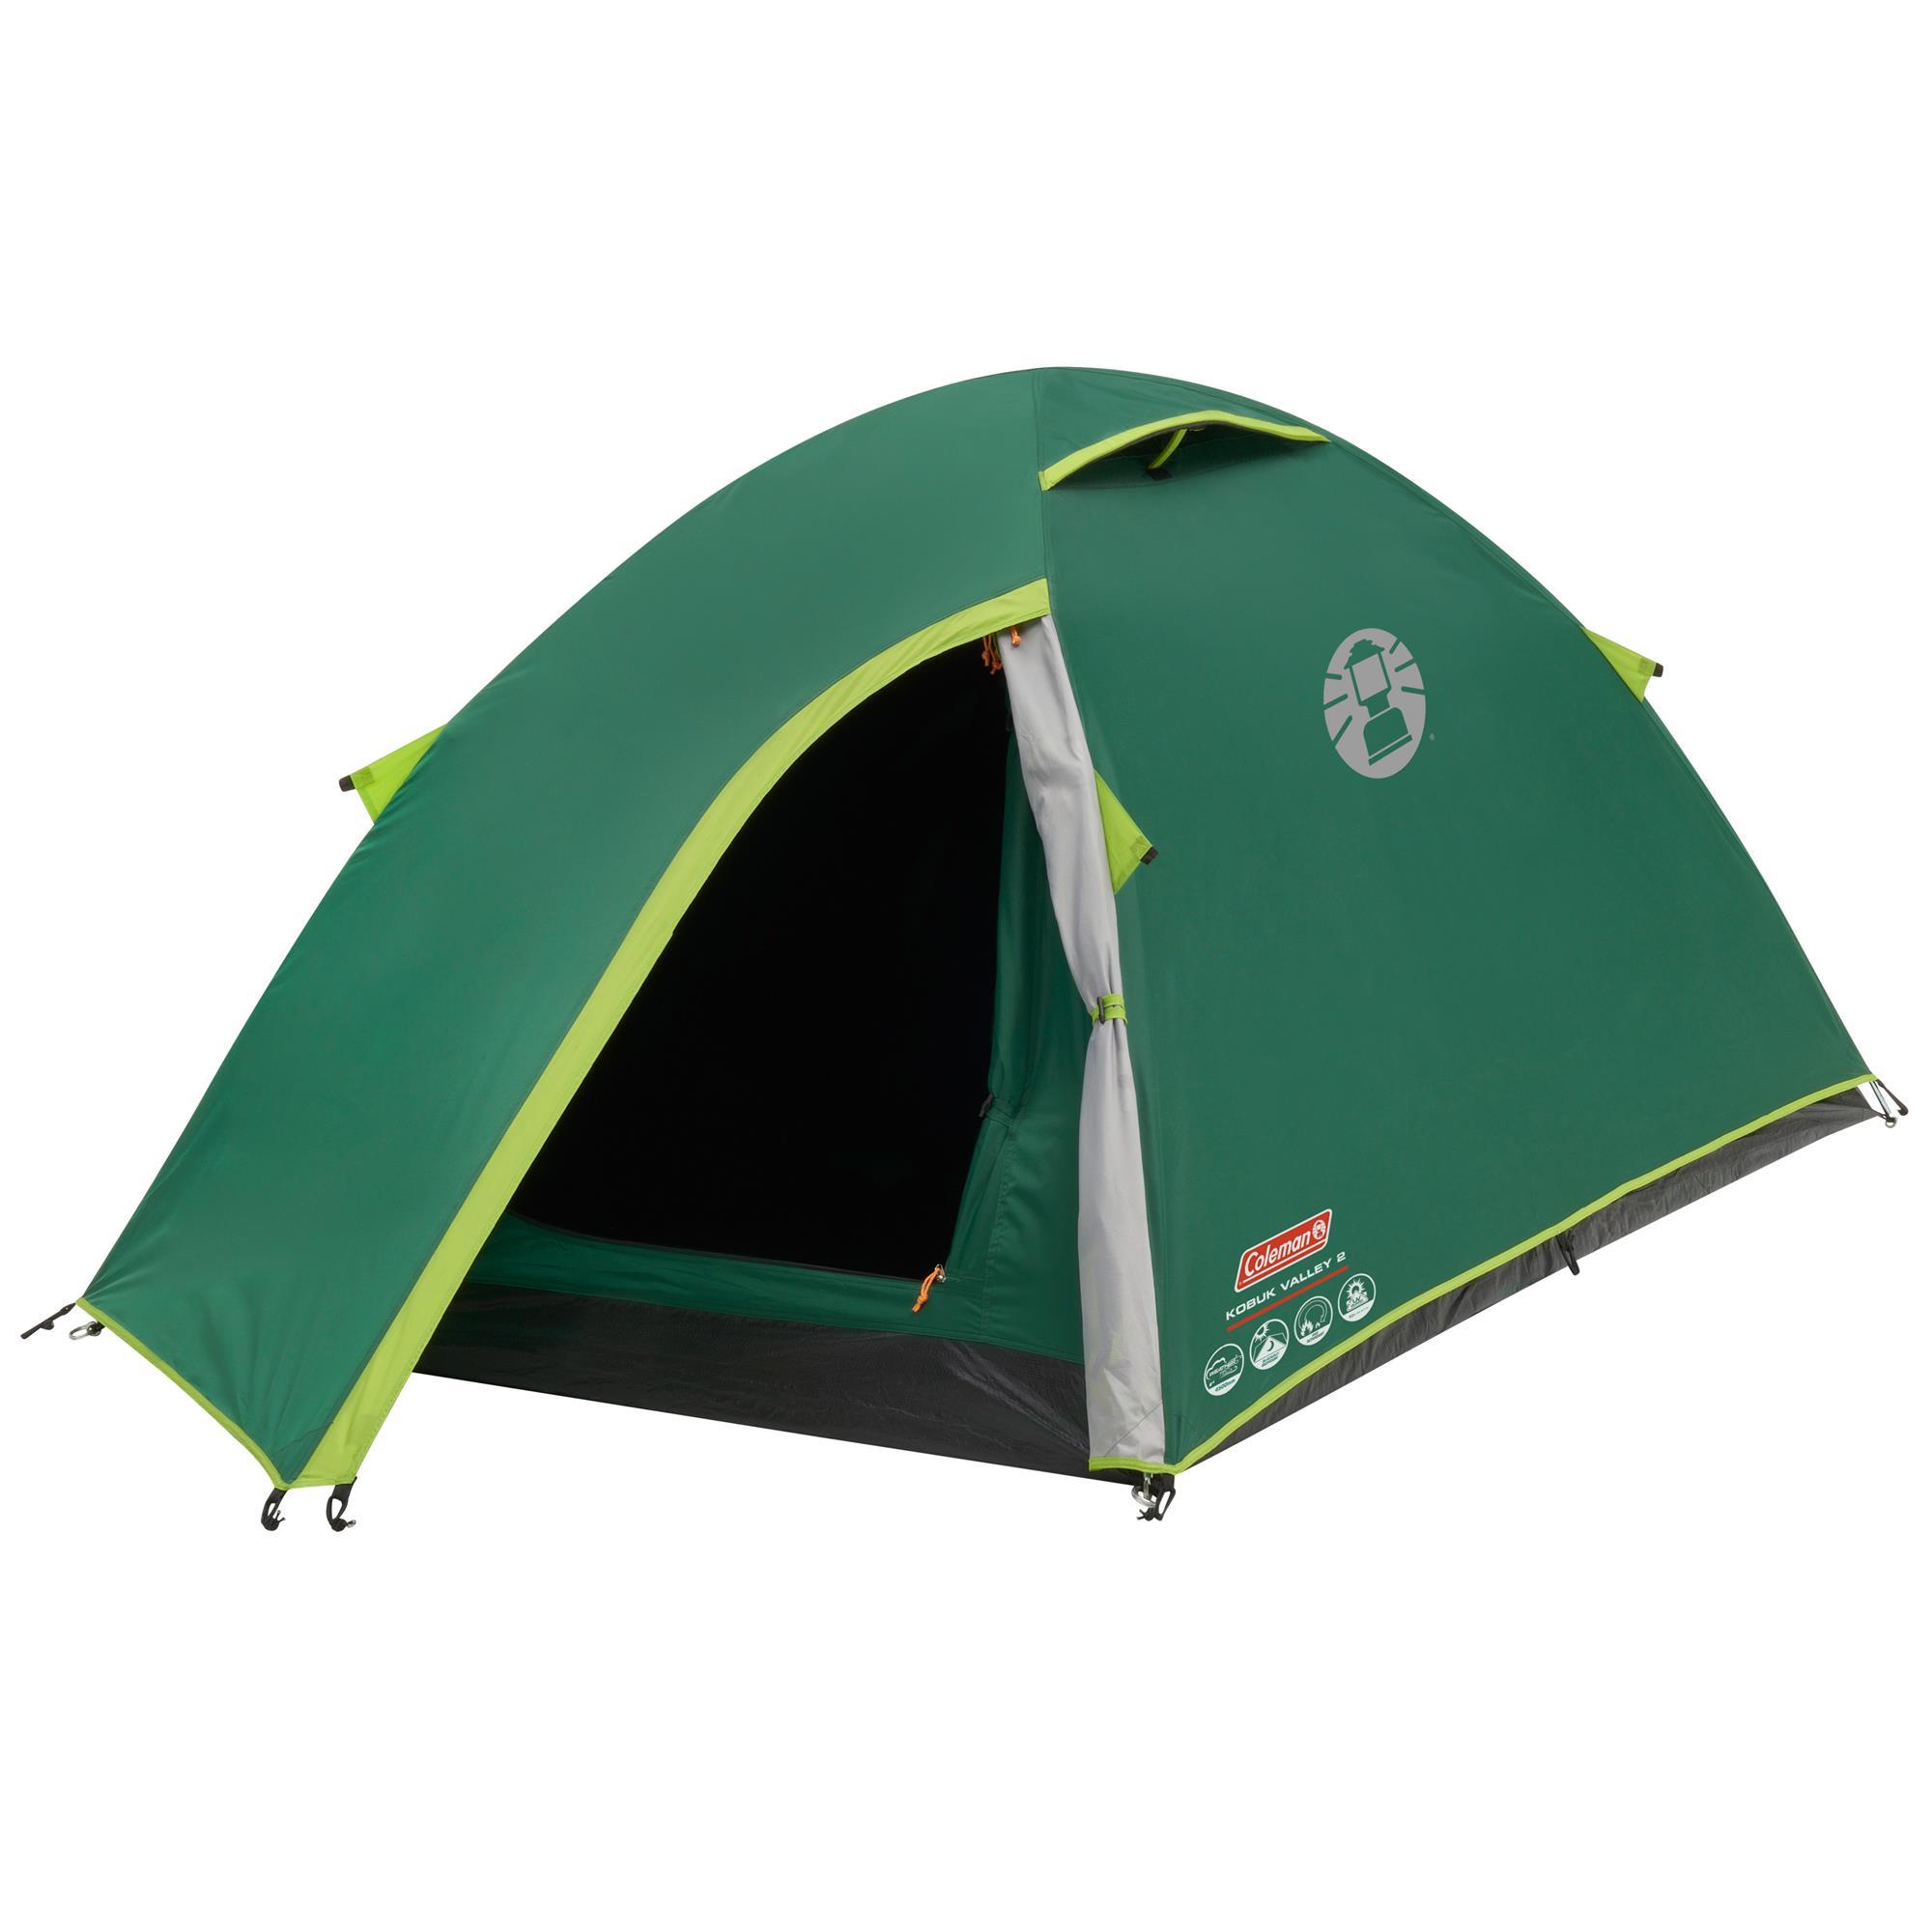 Image of Coleman Kobuk Valley 2 Campingzelt grün